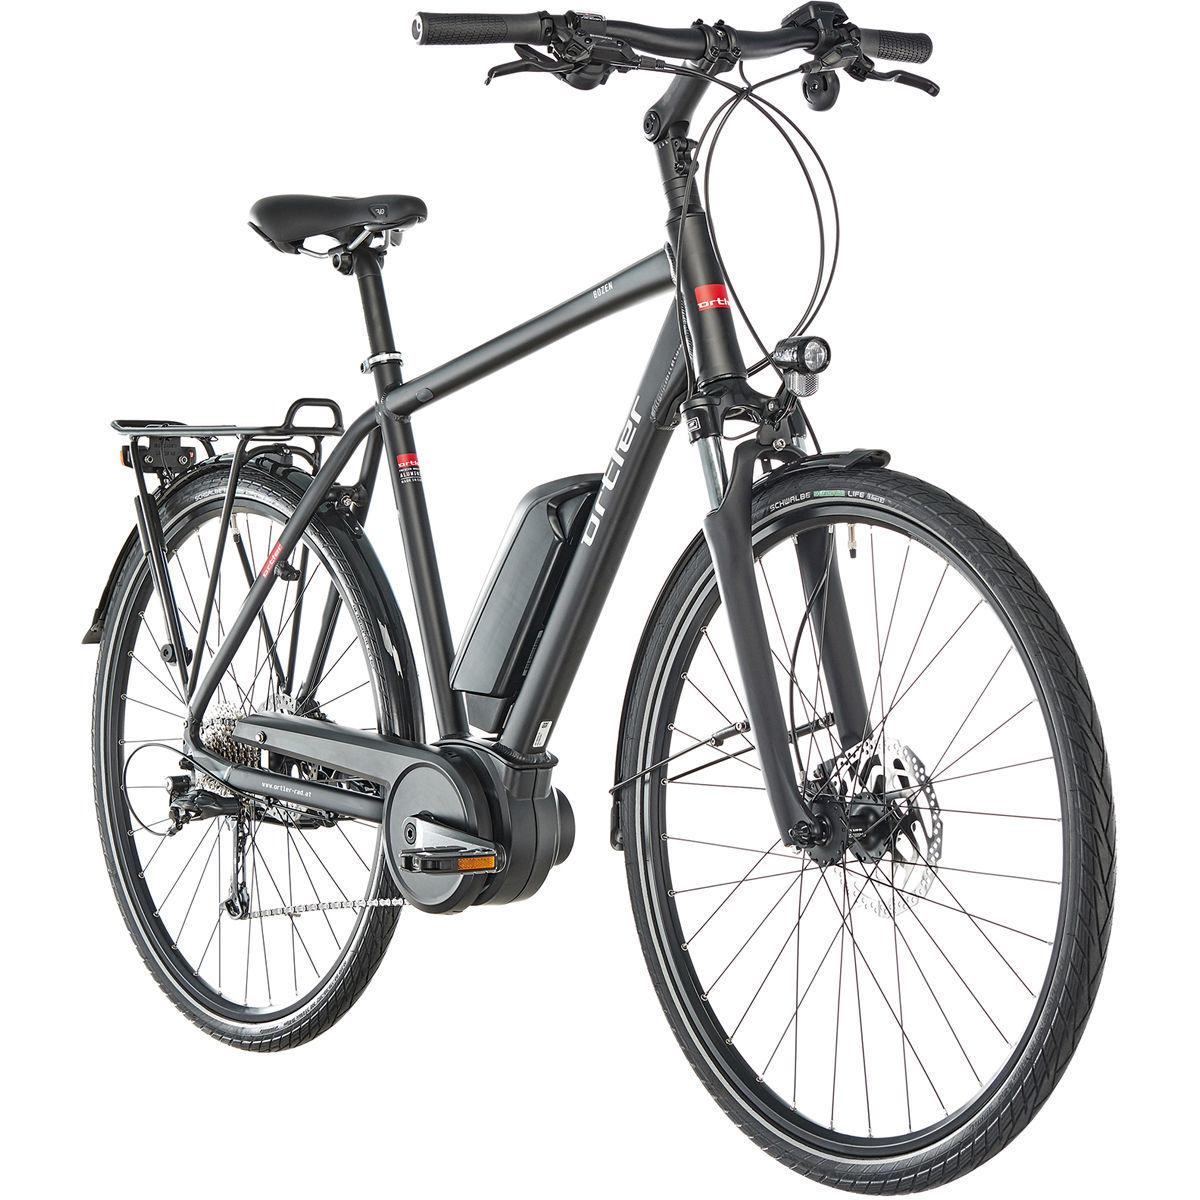 ortler bozen e bike f r 799 ausverkauft auch andere. Black Bedroom Furniture Sets. Home Design Ideas